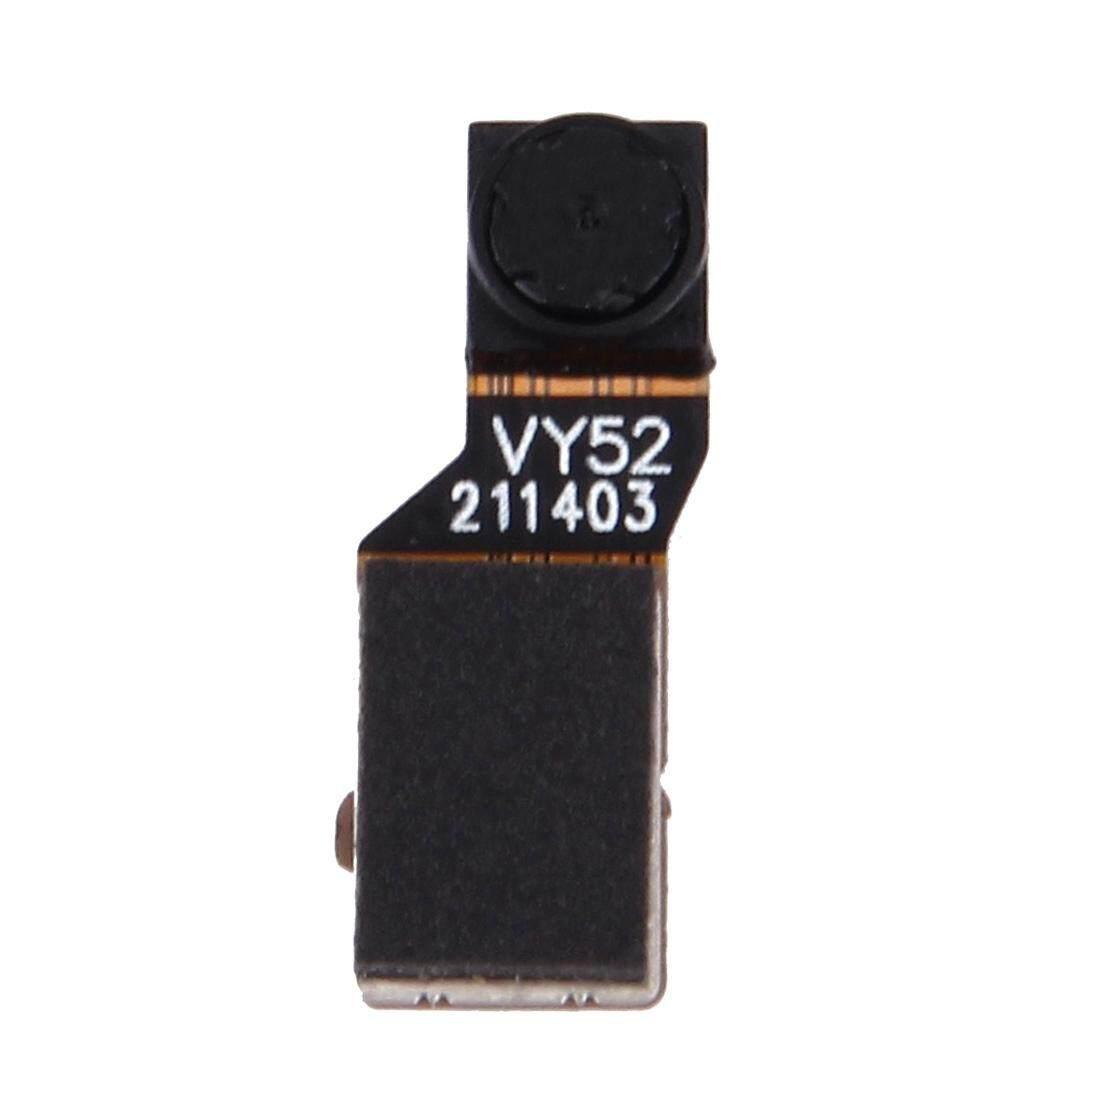 I Parts Beli Depan Penggantian Lensa Kamera untuk Sony Xperia M2/D2303/D2305/D2306